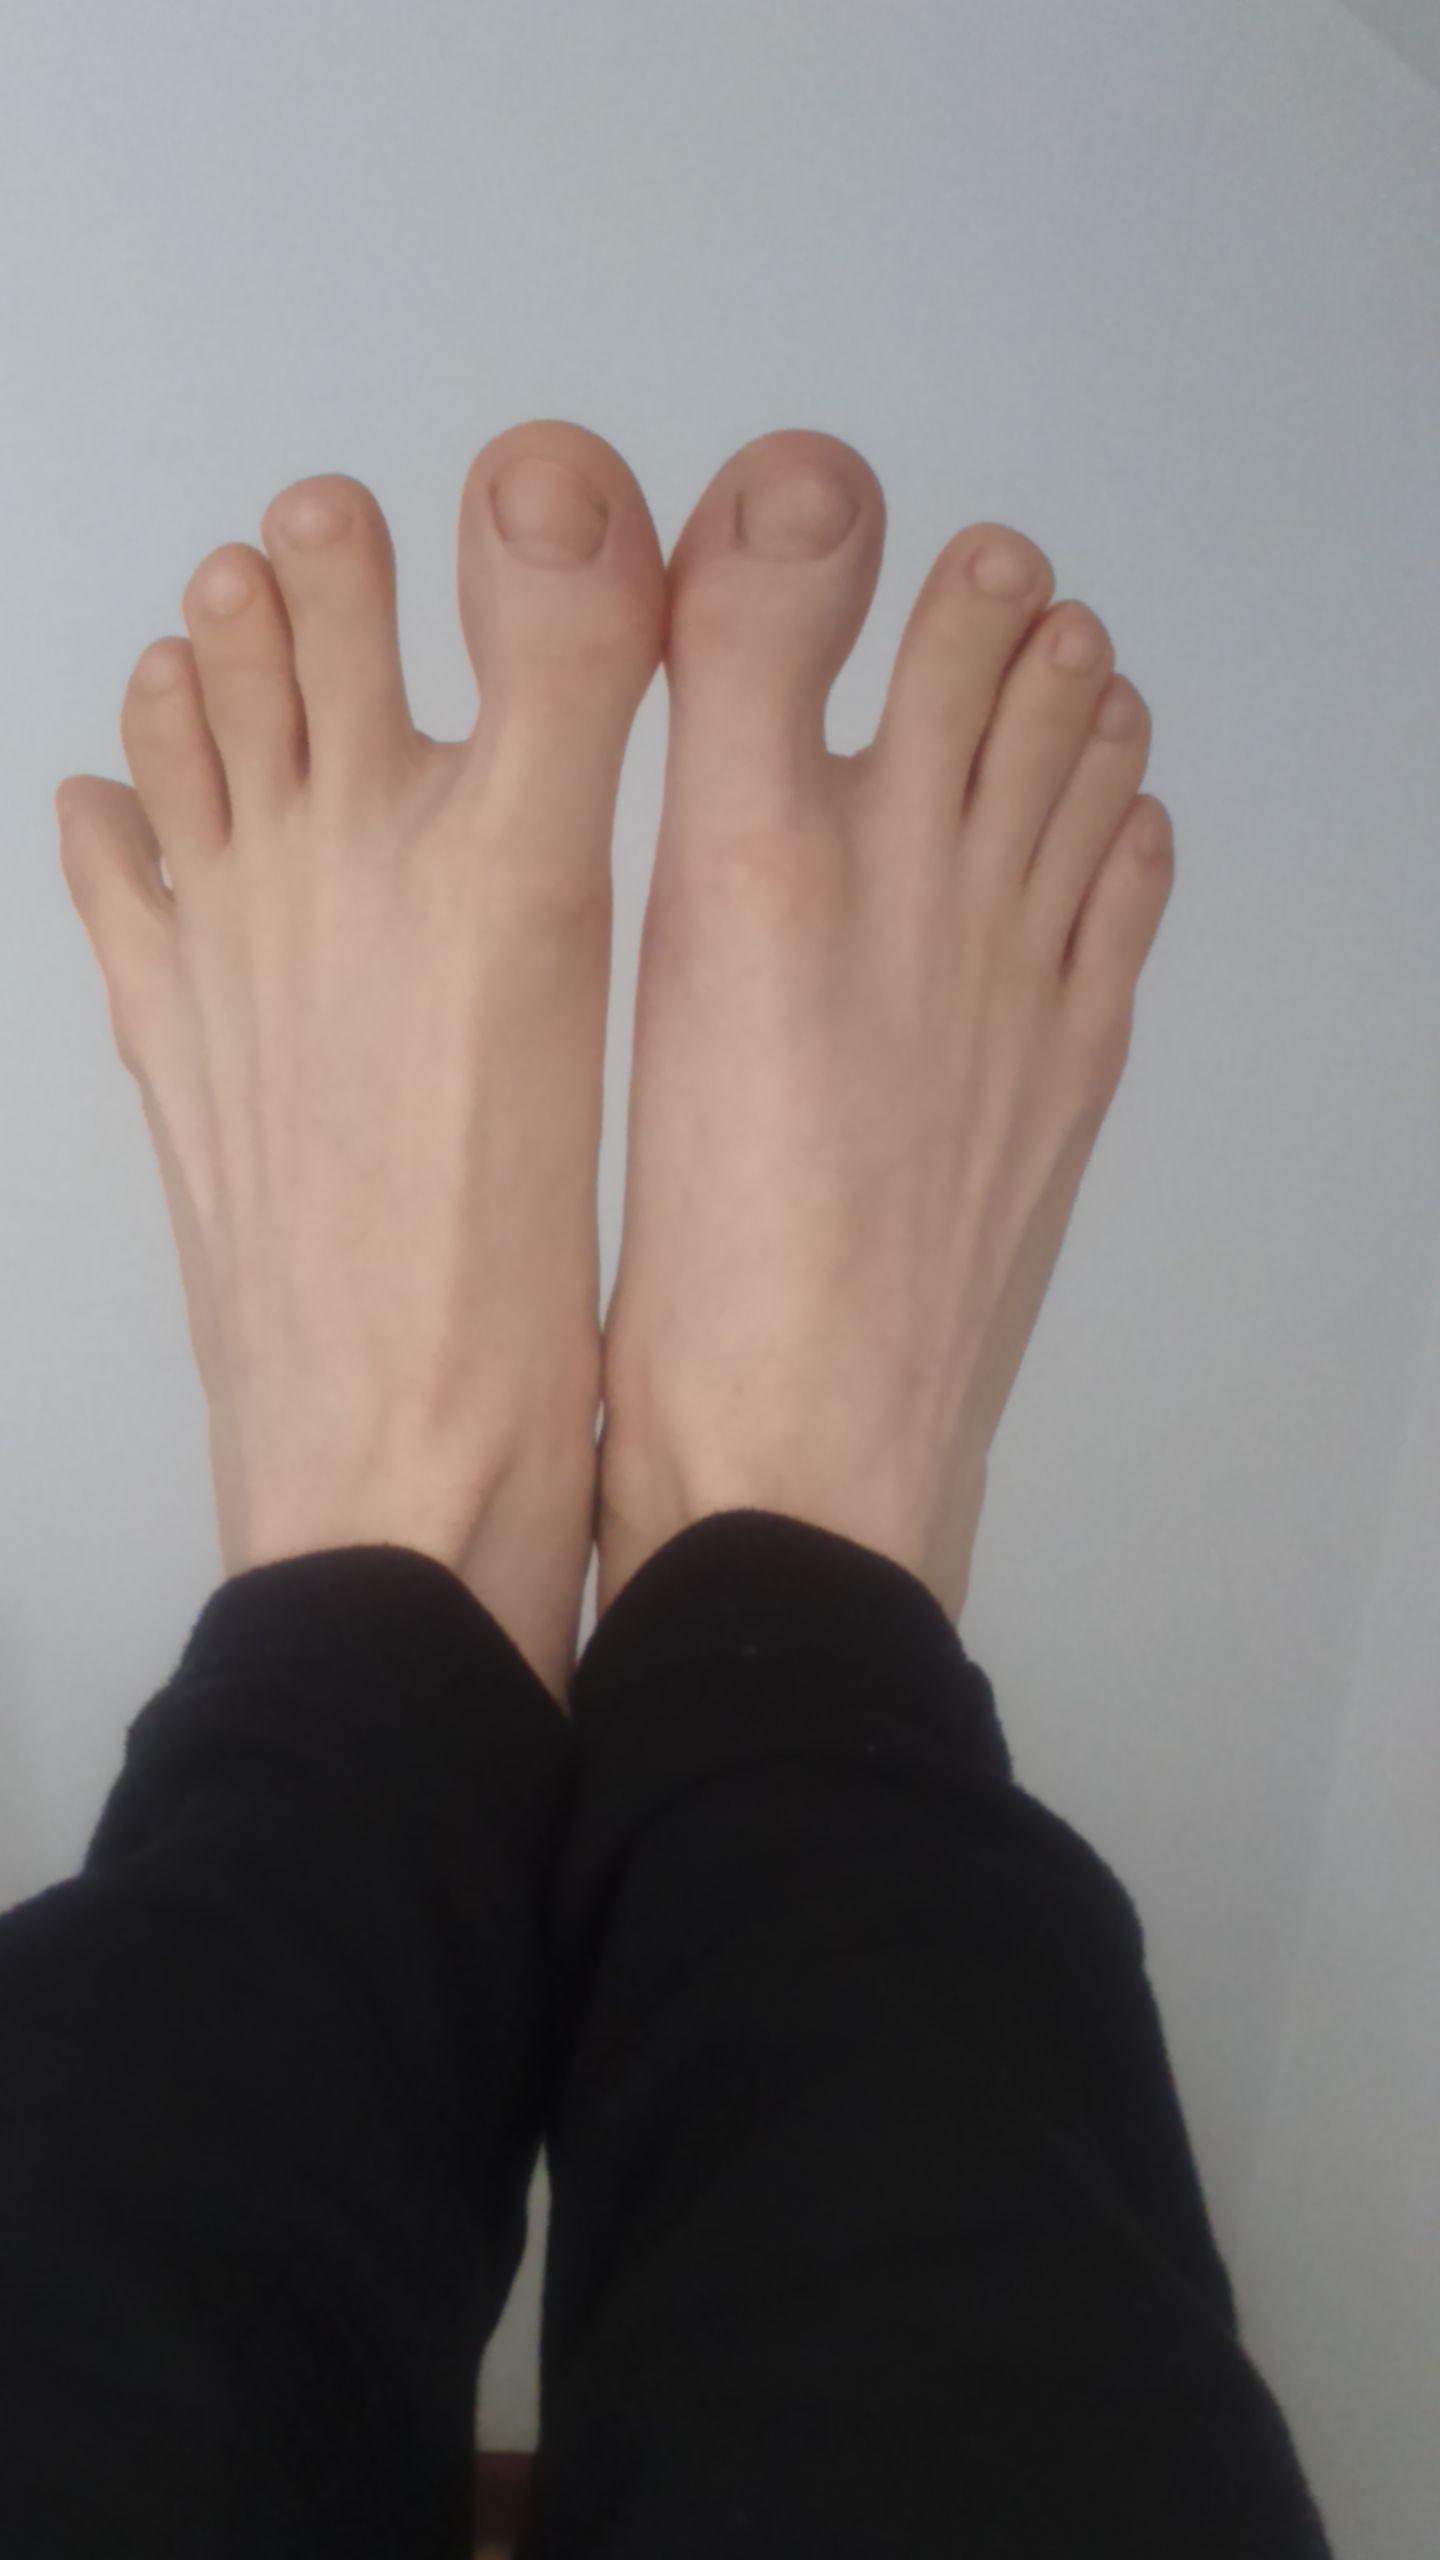 Mature Male Feet